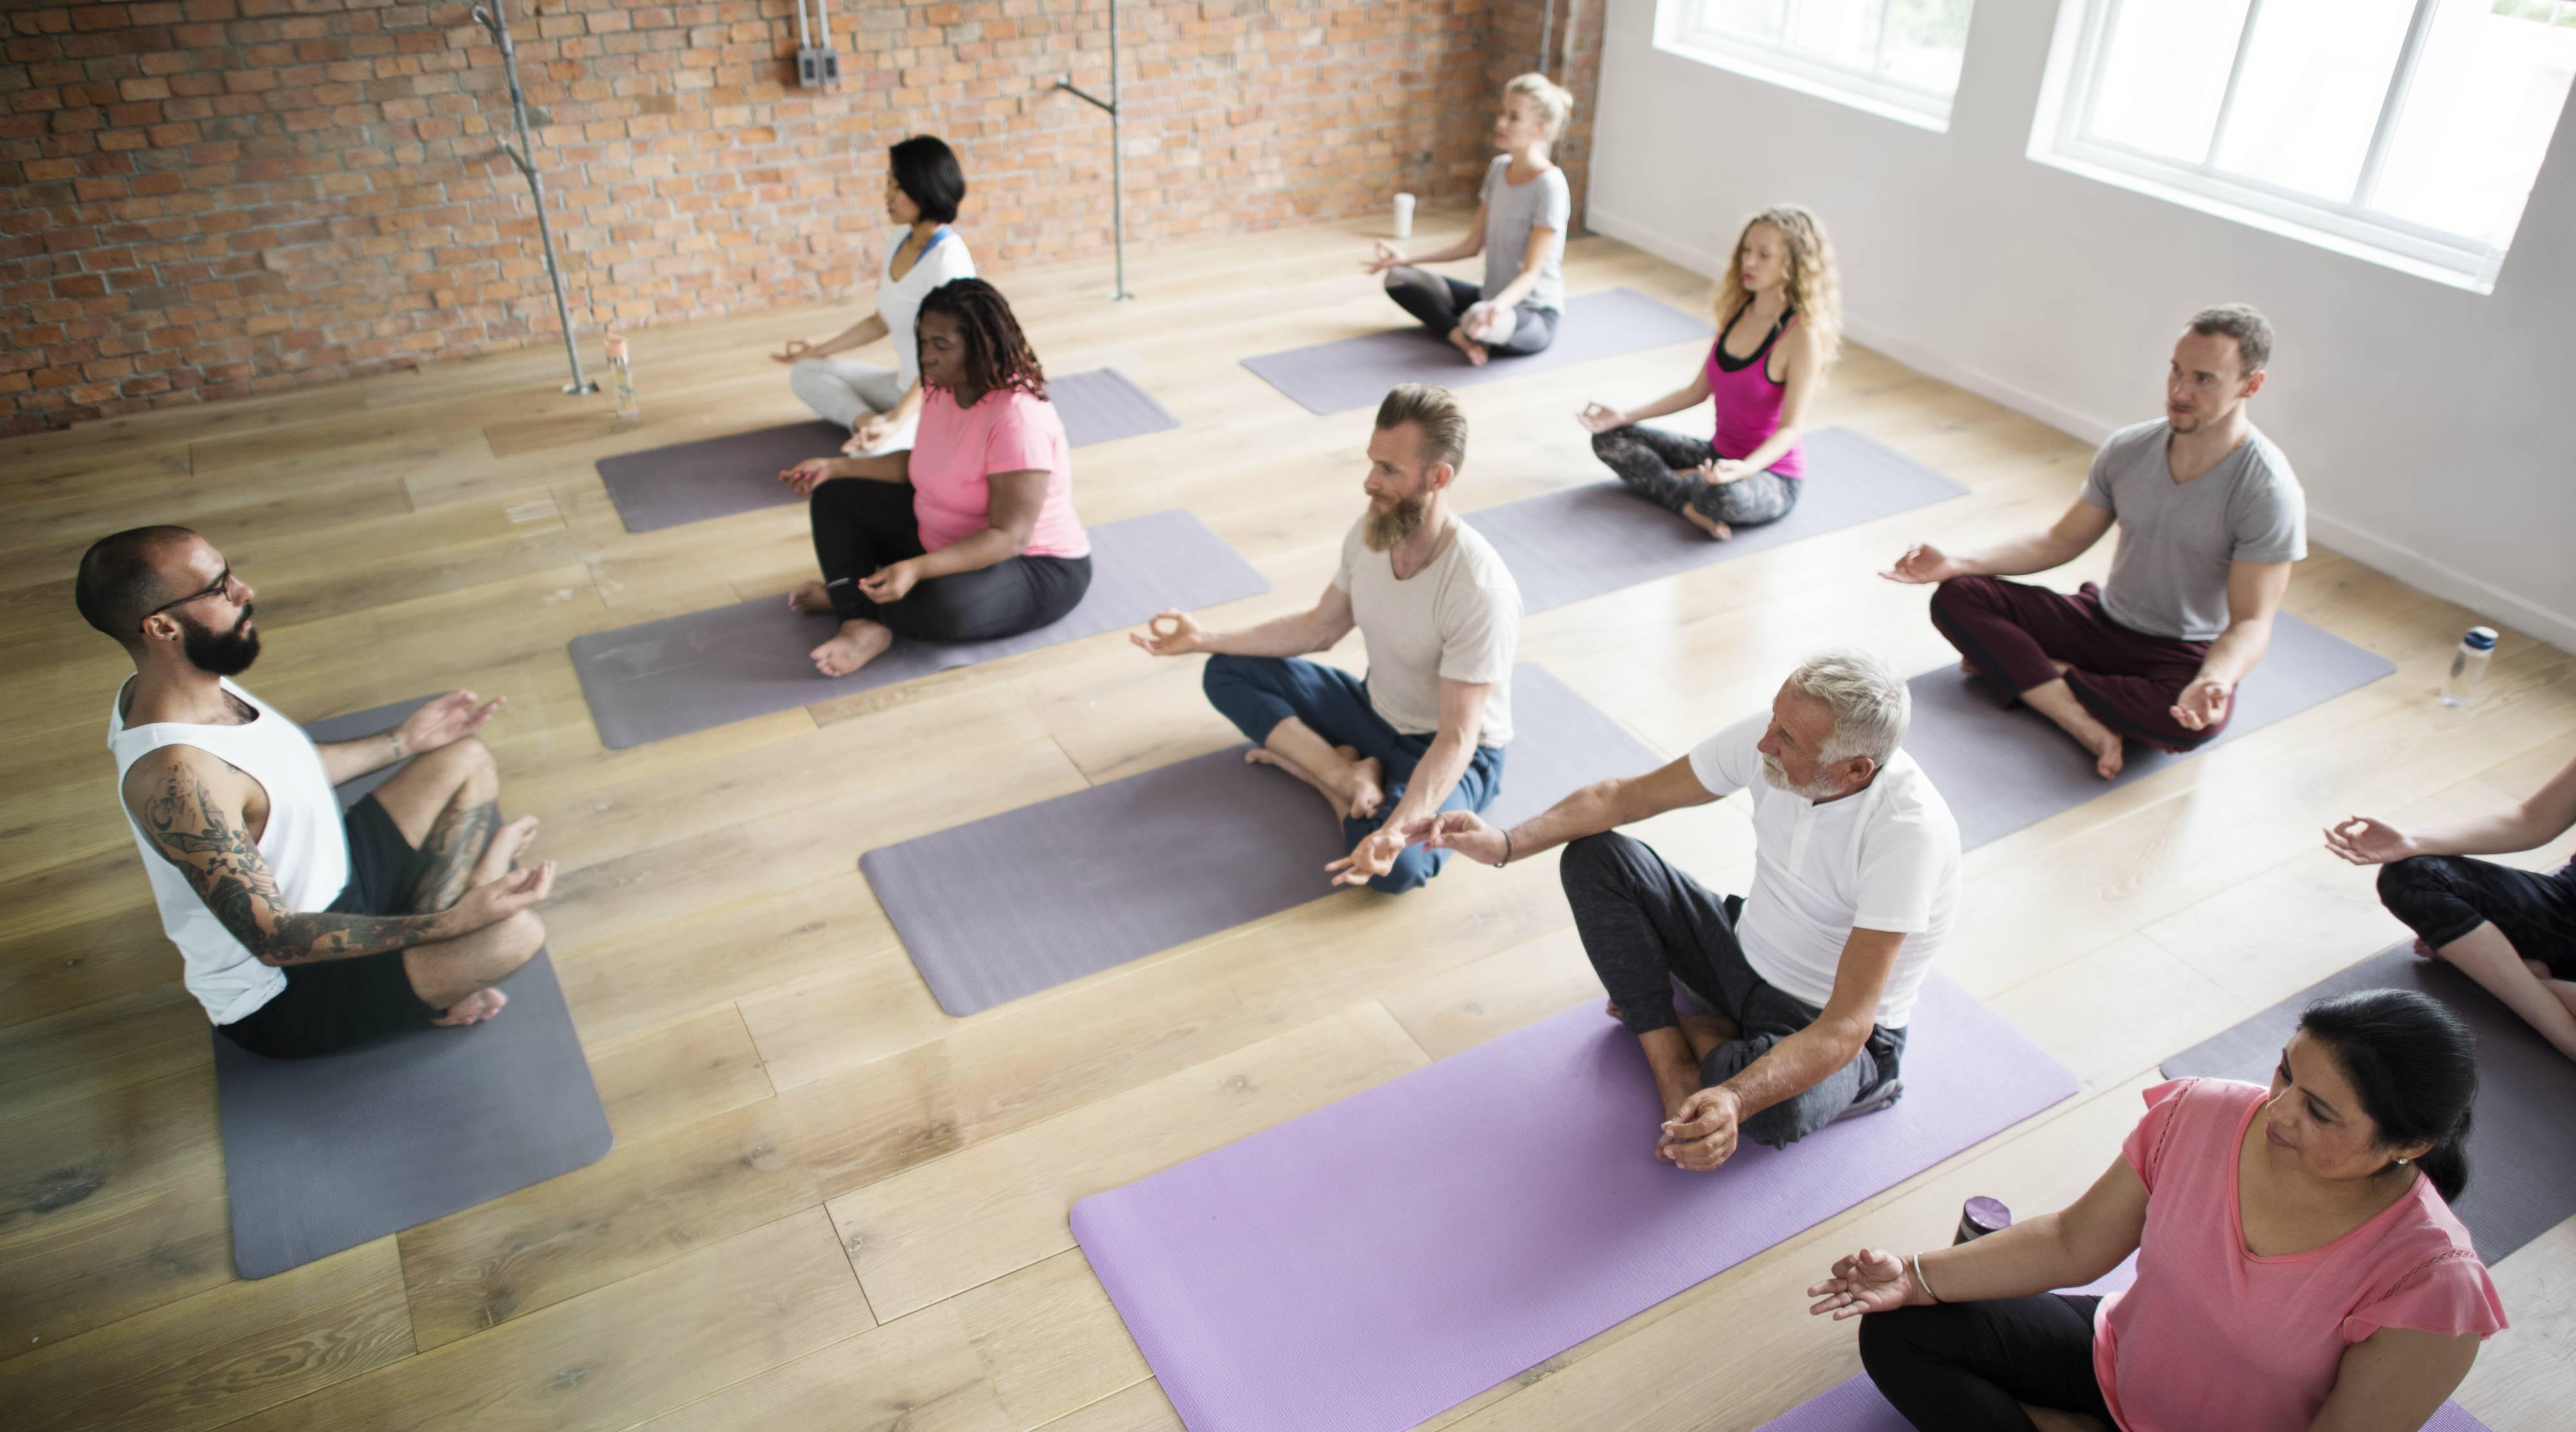 Антигравити йога в гамаках: зачем нужна аэро йога, воздушная йога